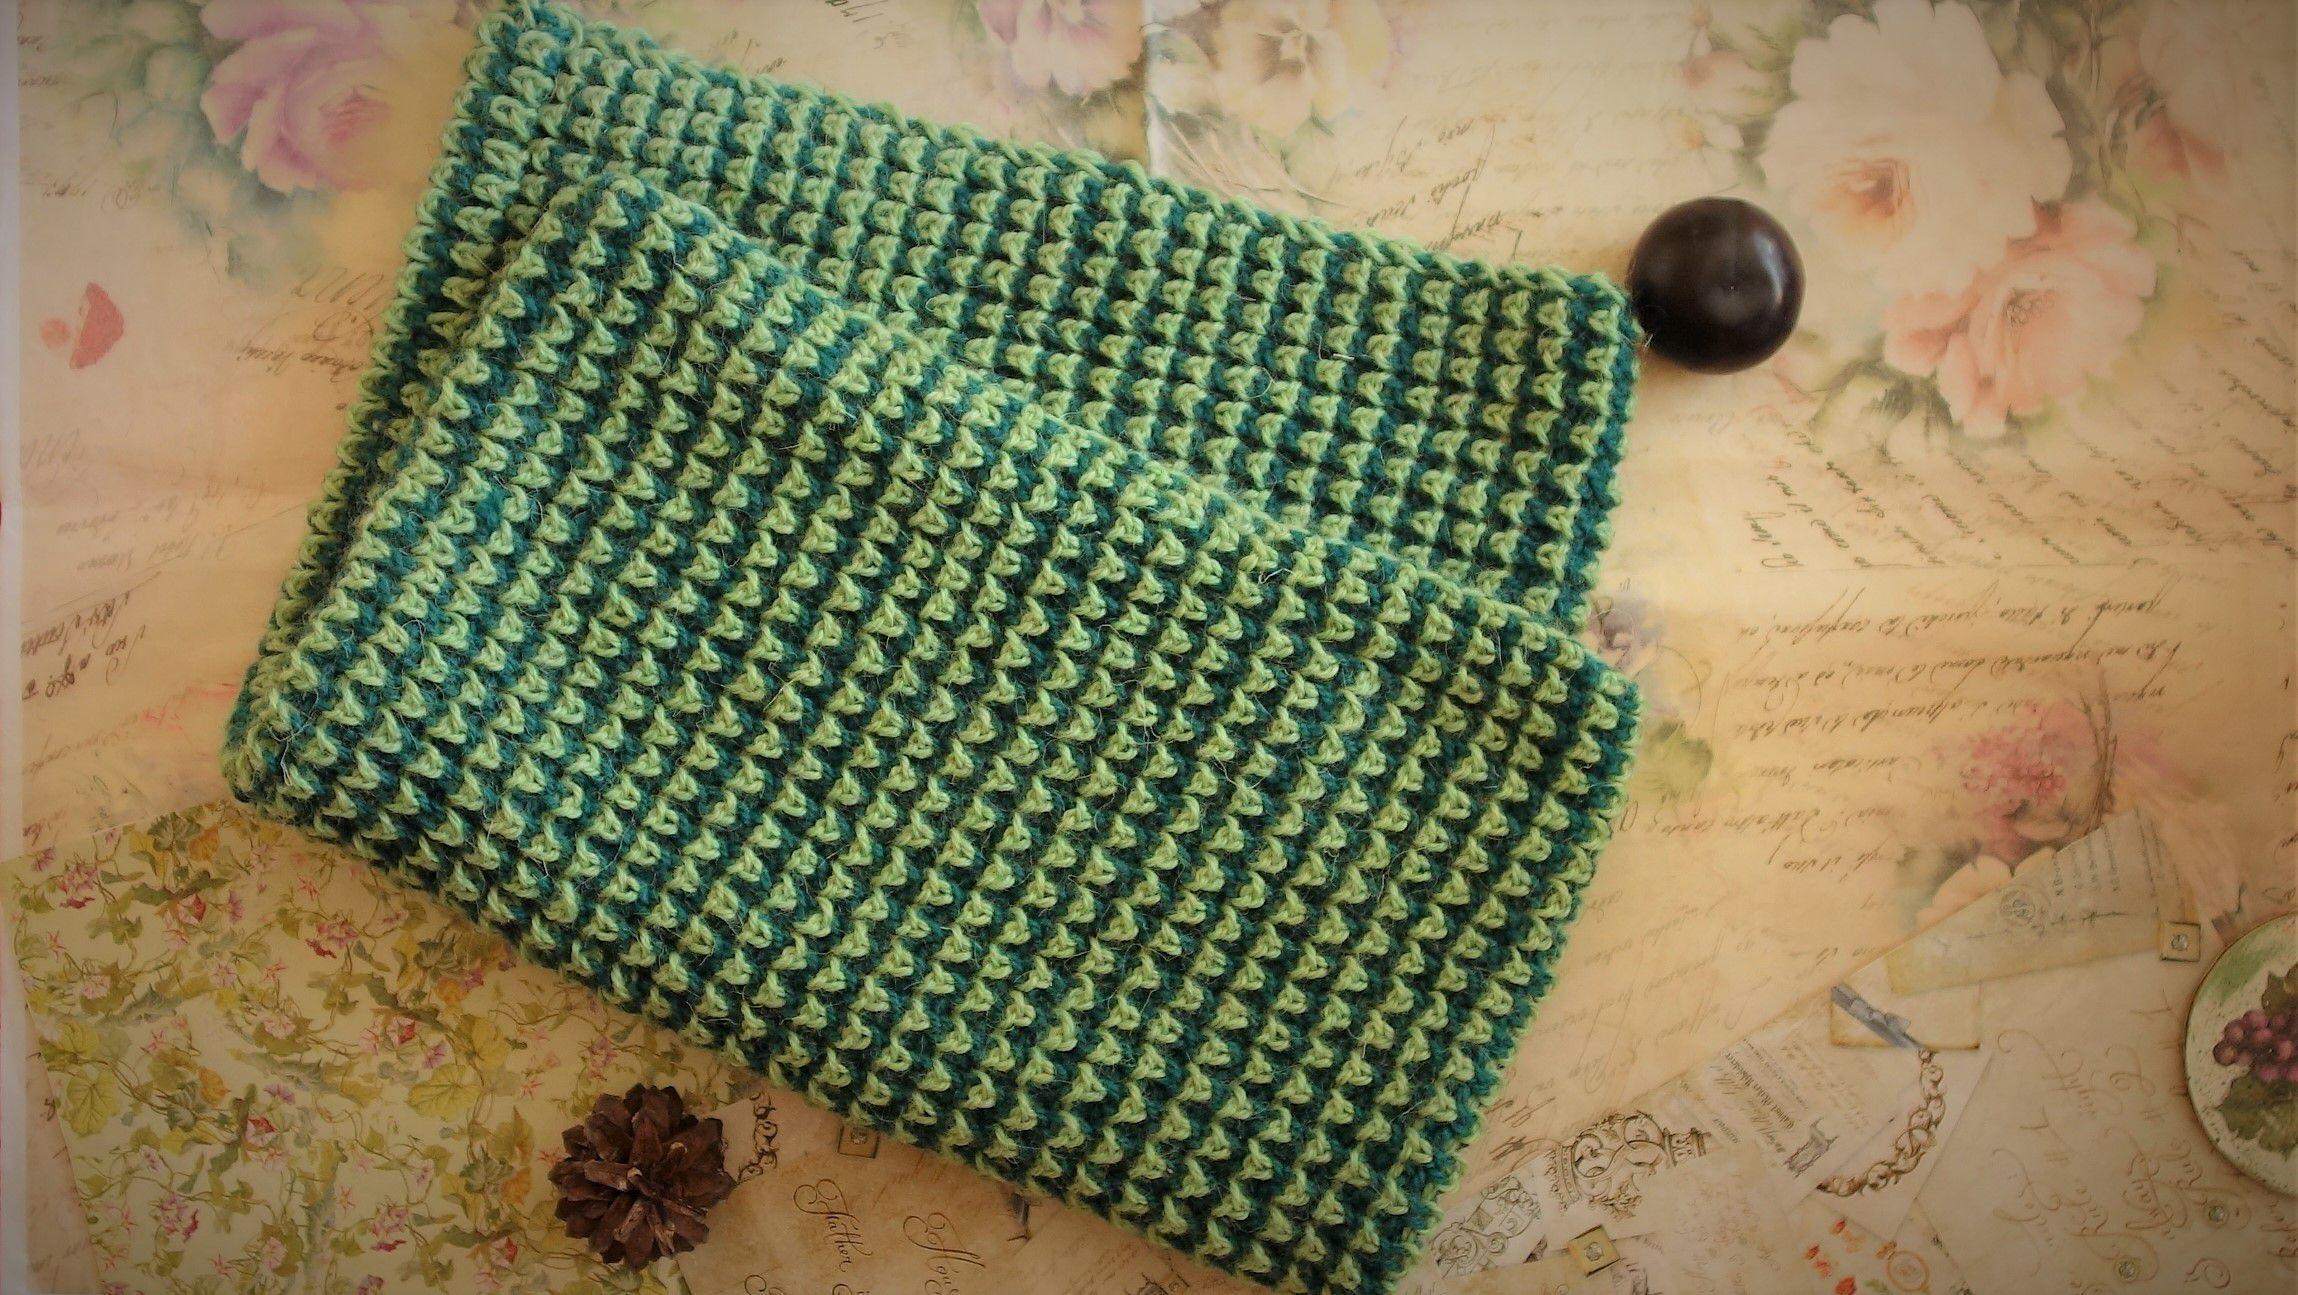 шарфтруба шарф шарфвязаный аксессуар зеленыйснуд теплыйшарф шарфзимний вязание снуд подарок снудвязаный ручнаяработа